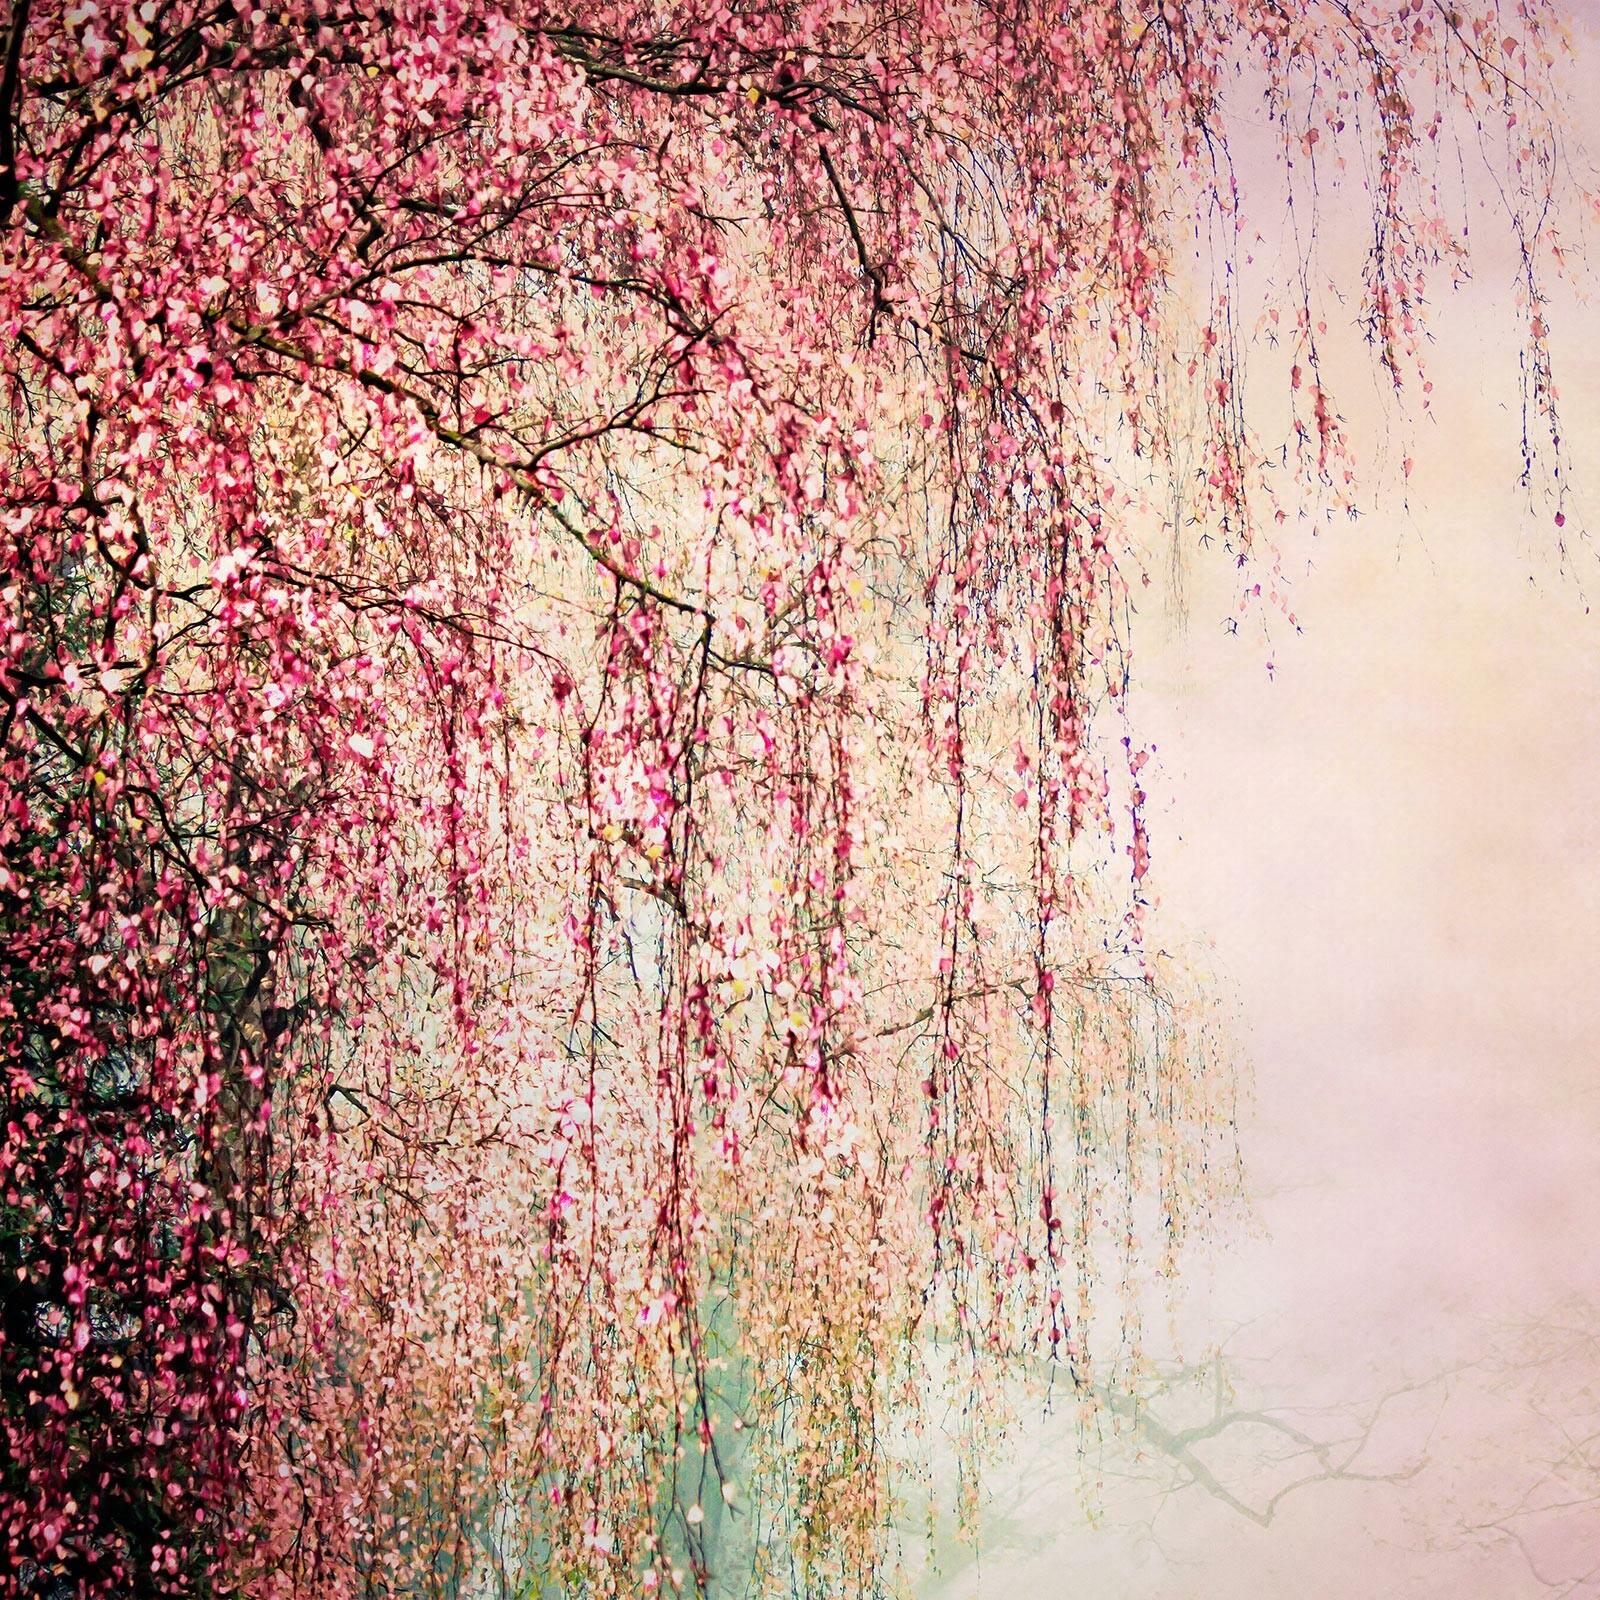 Mystic Forest - Christiane Steinicke